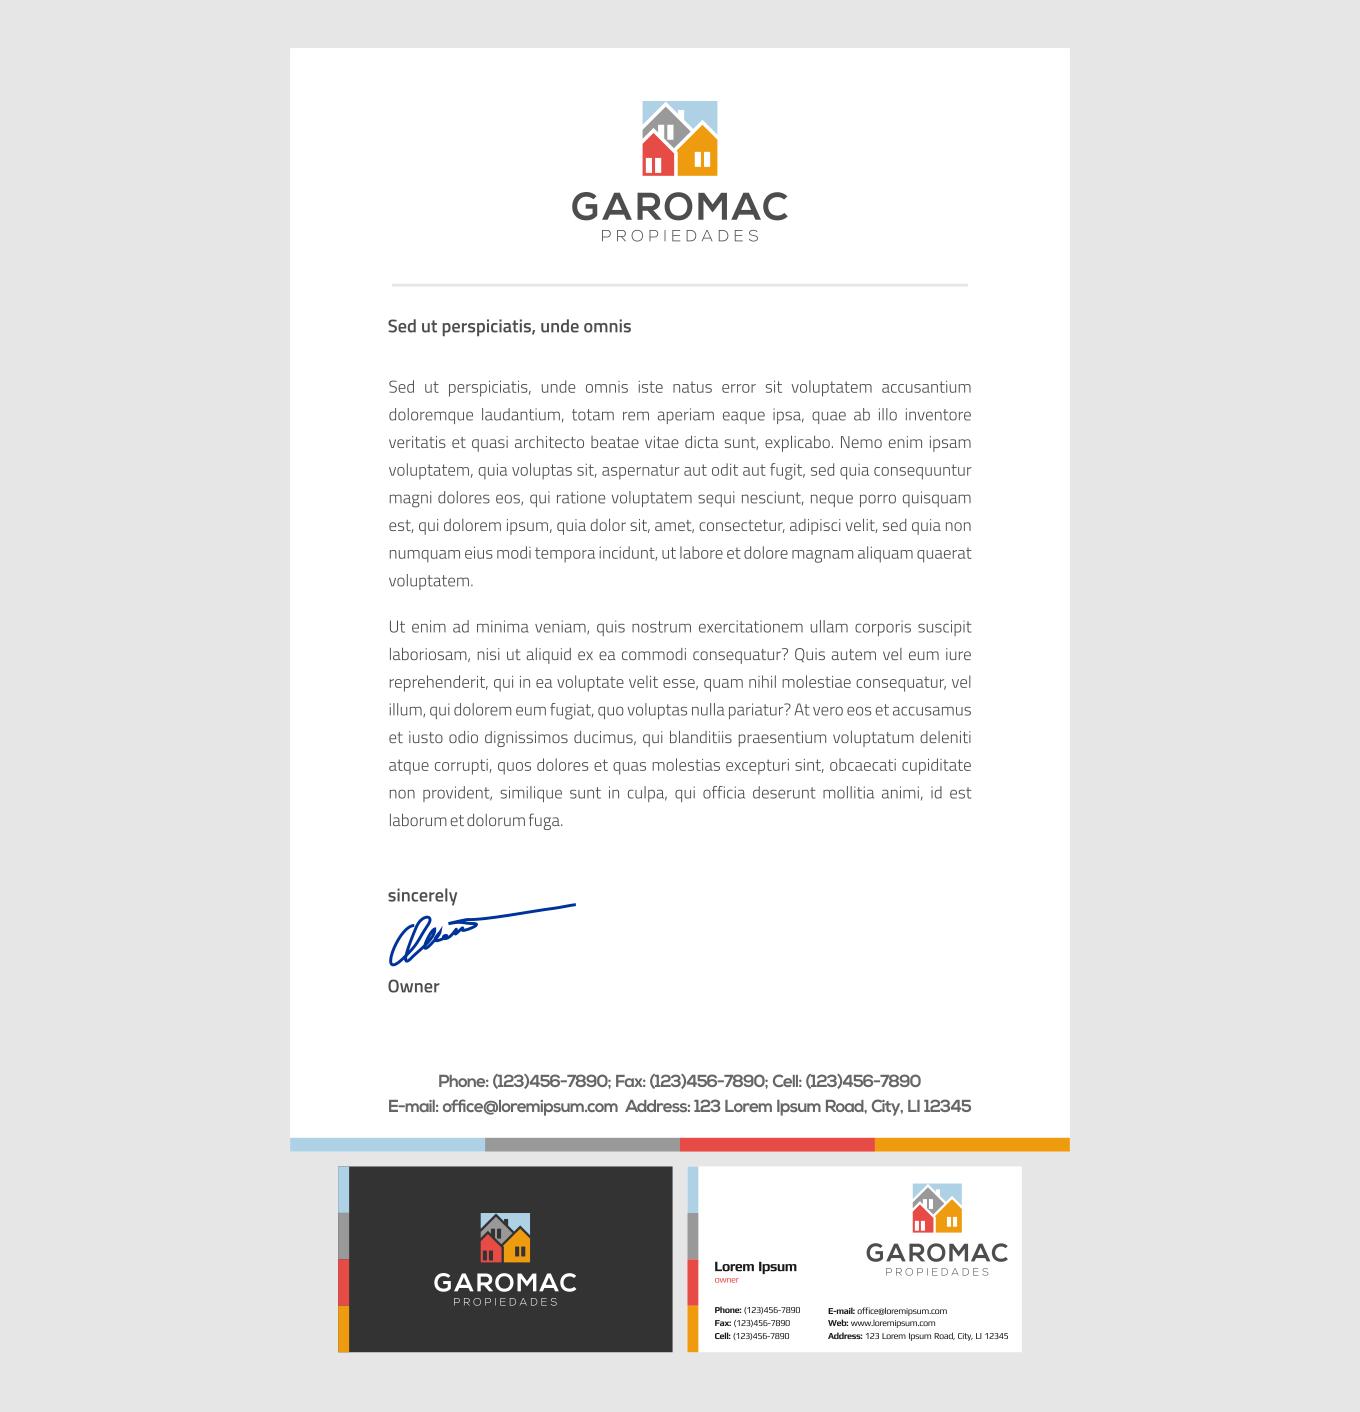 Garomac Propiedades business card